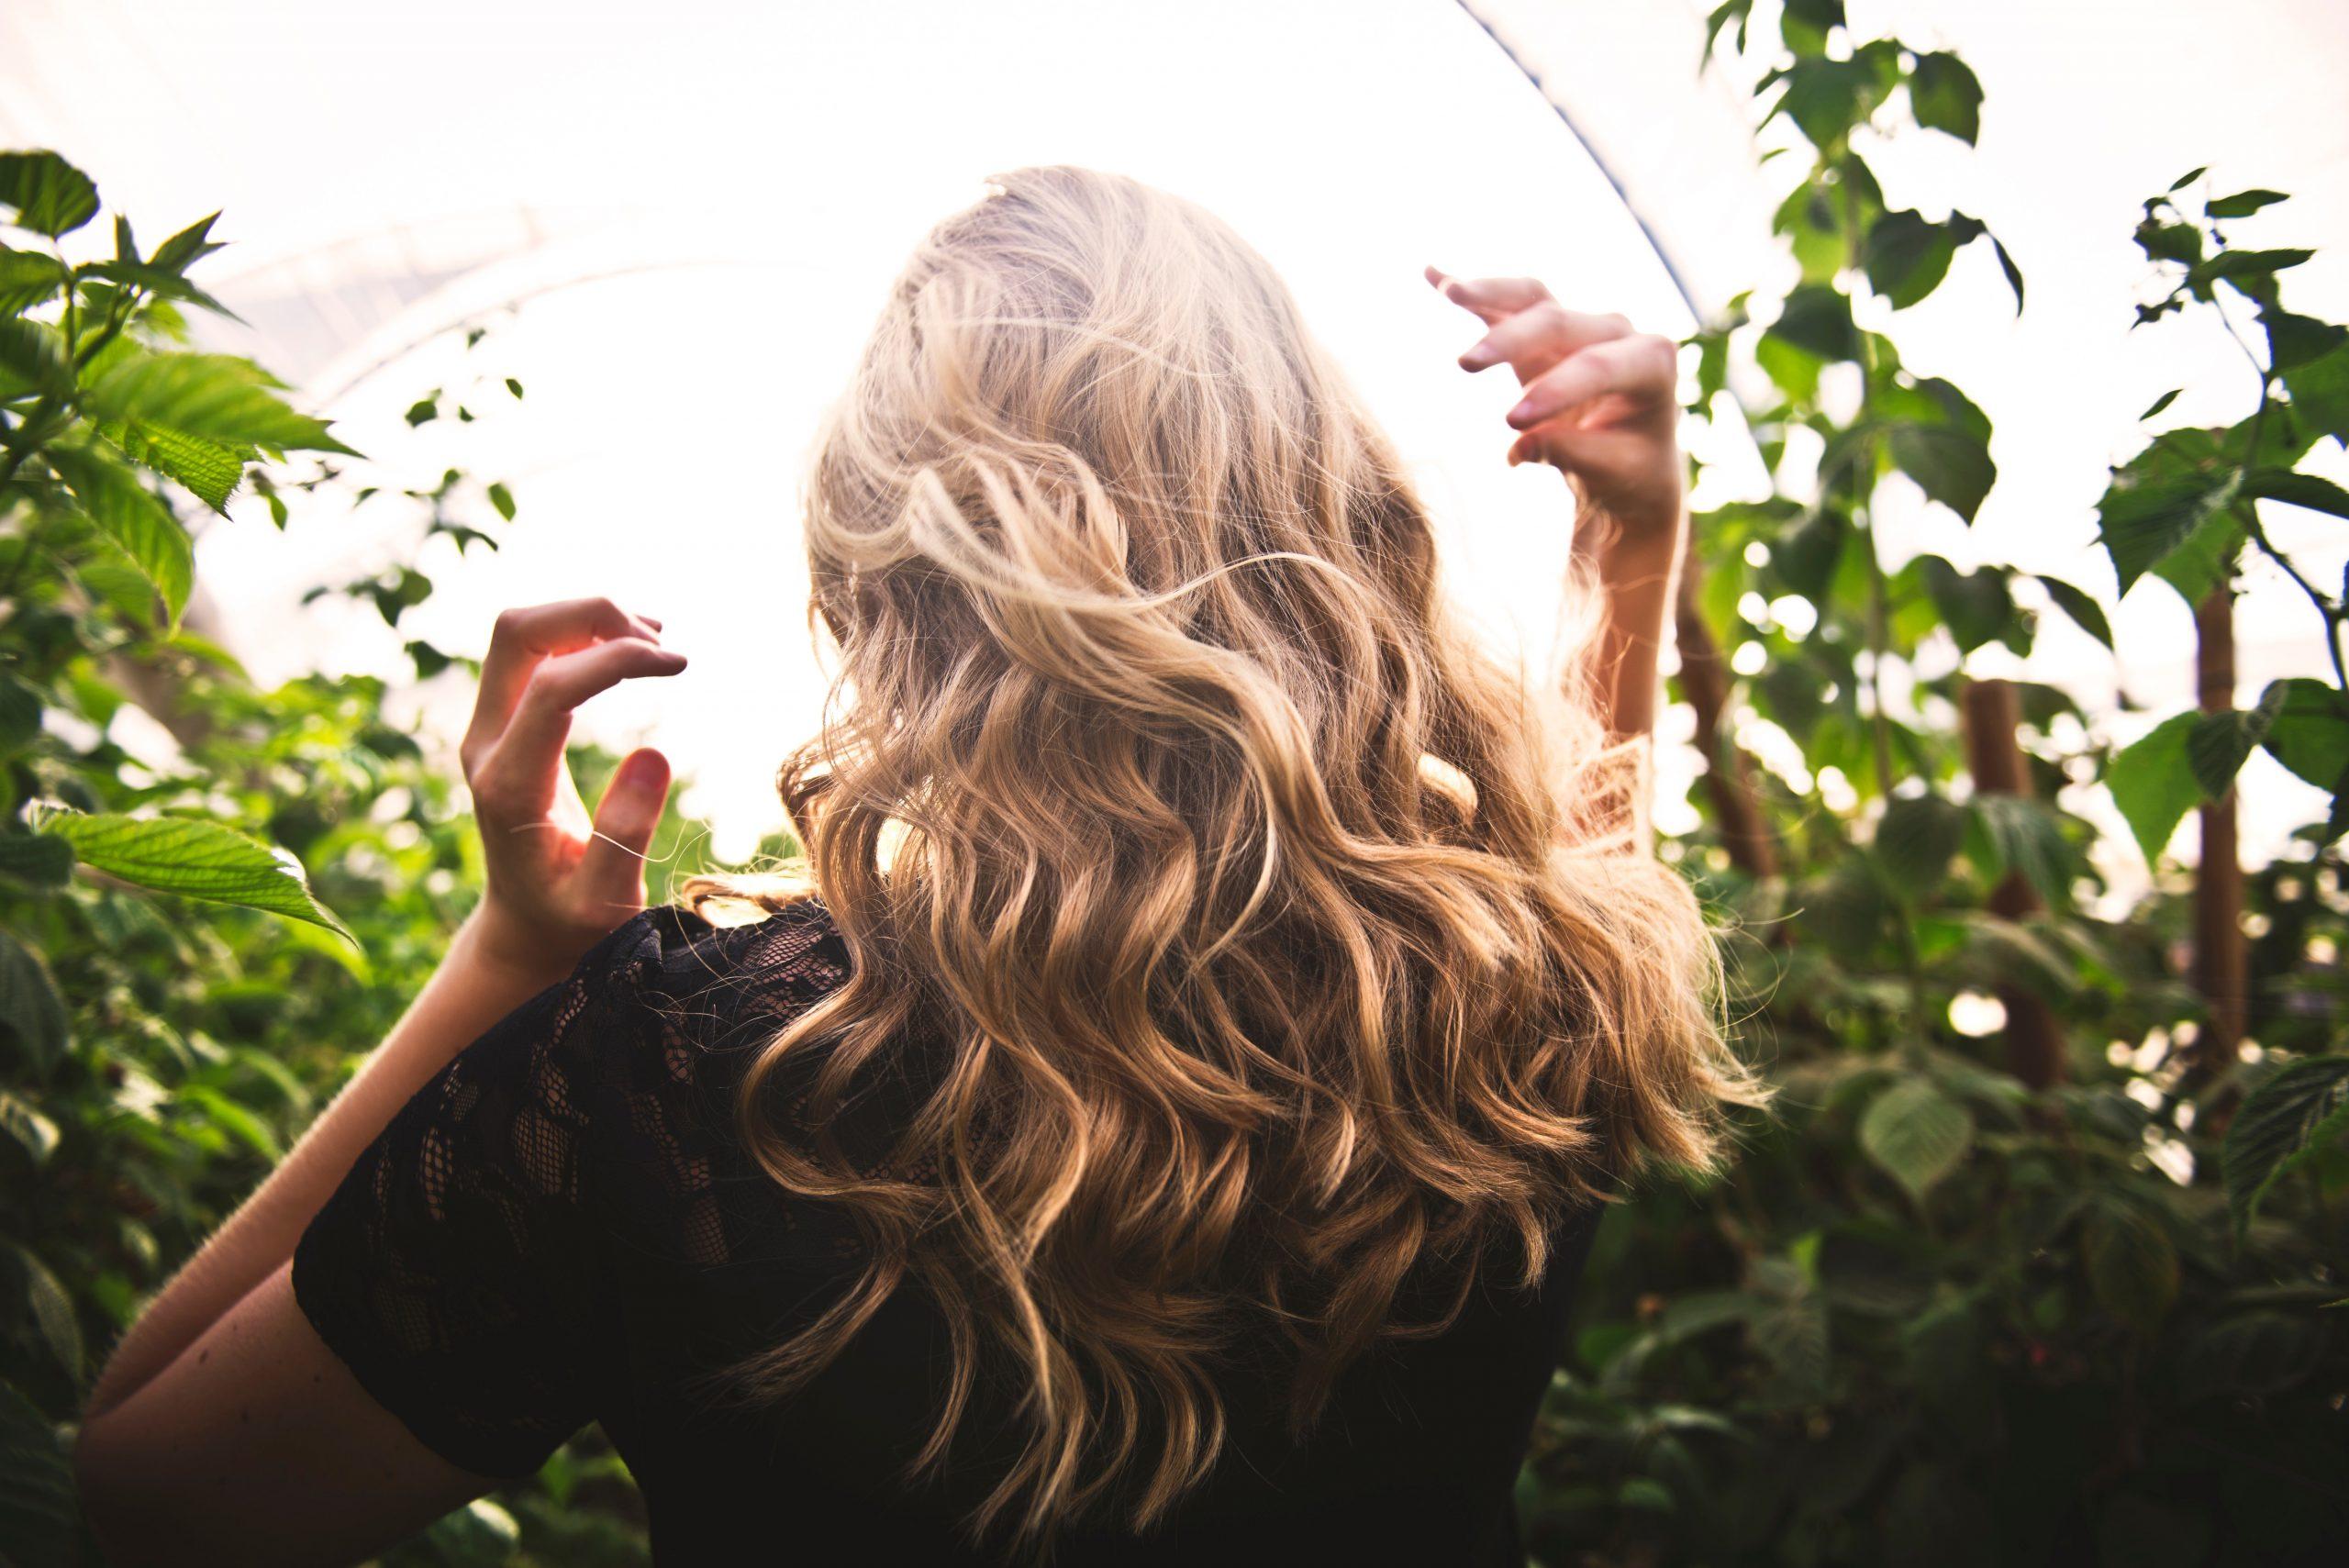 Can Nizoral Shampoo Help with Hair Loss